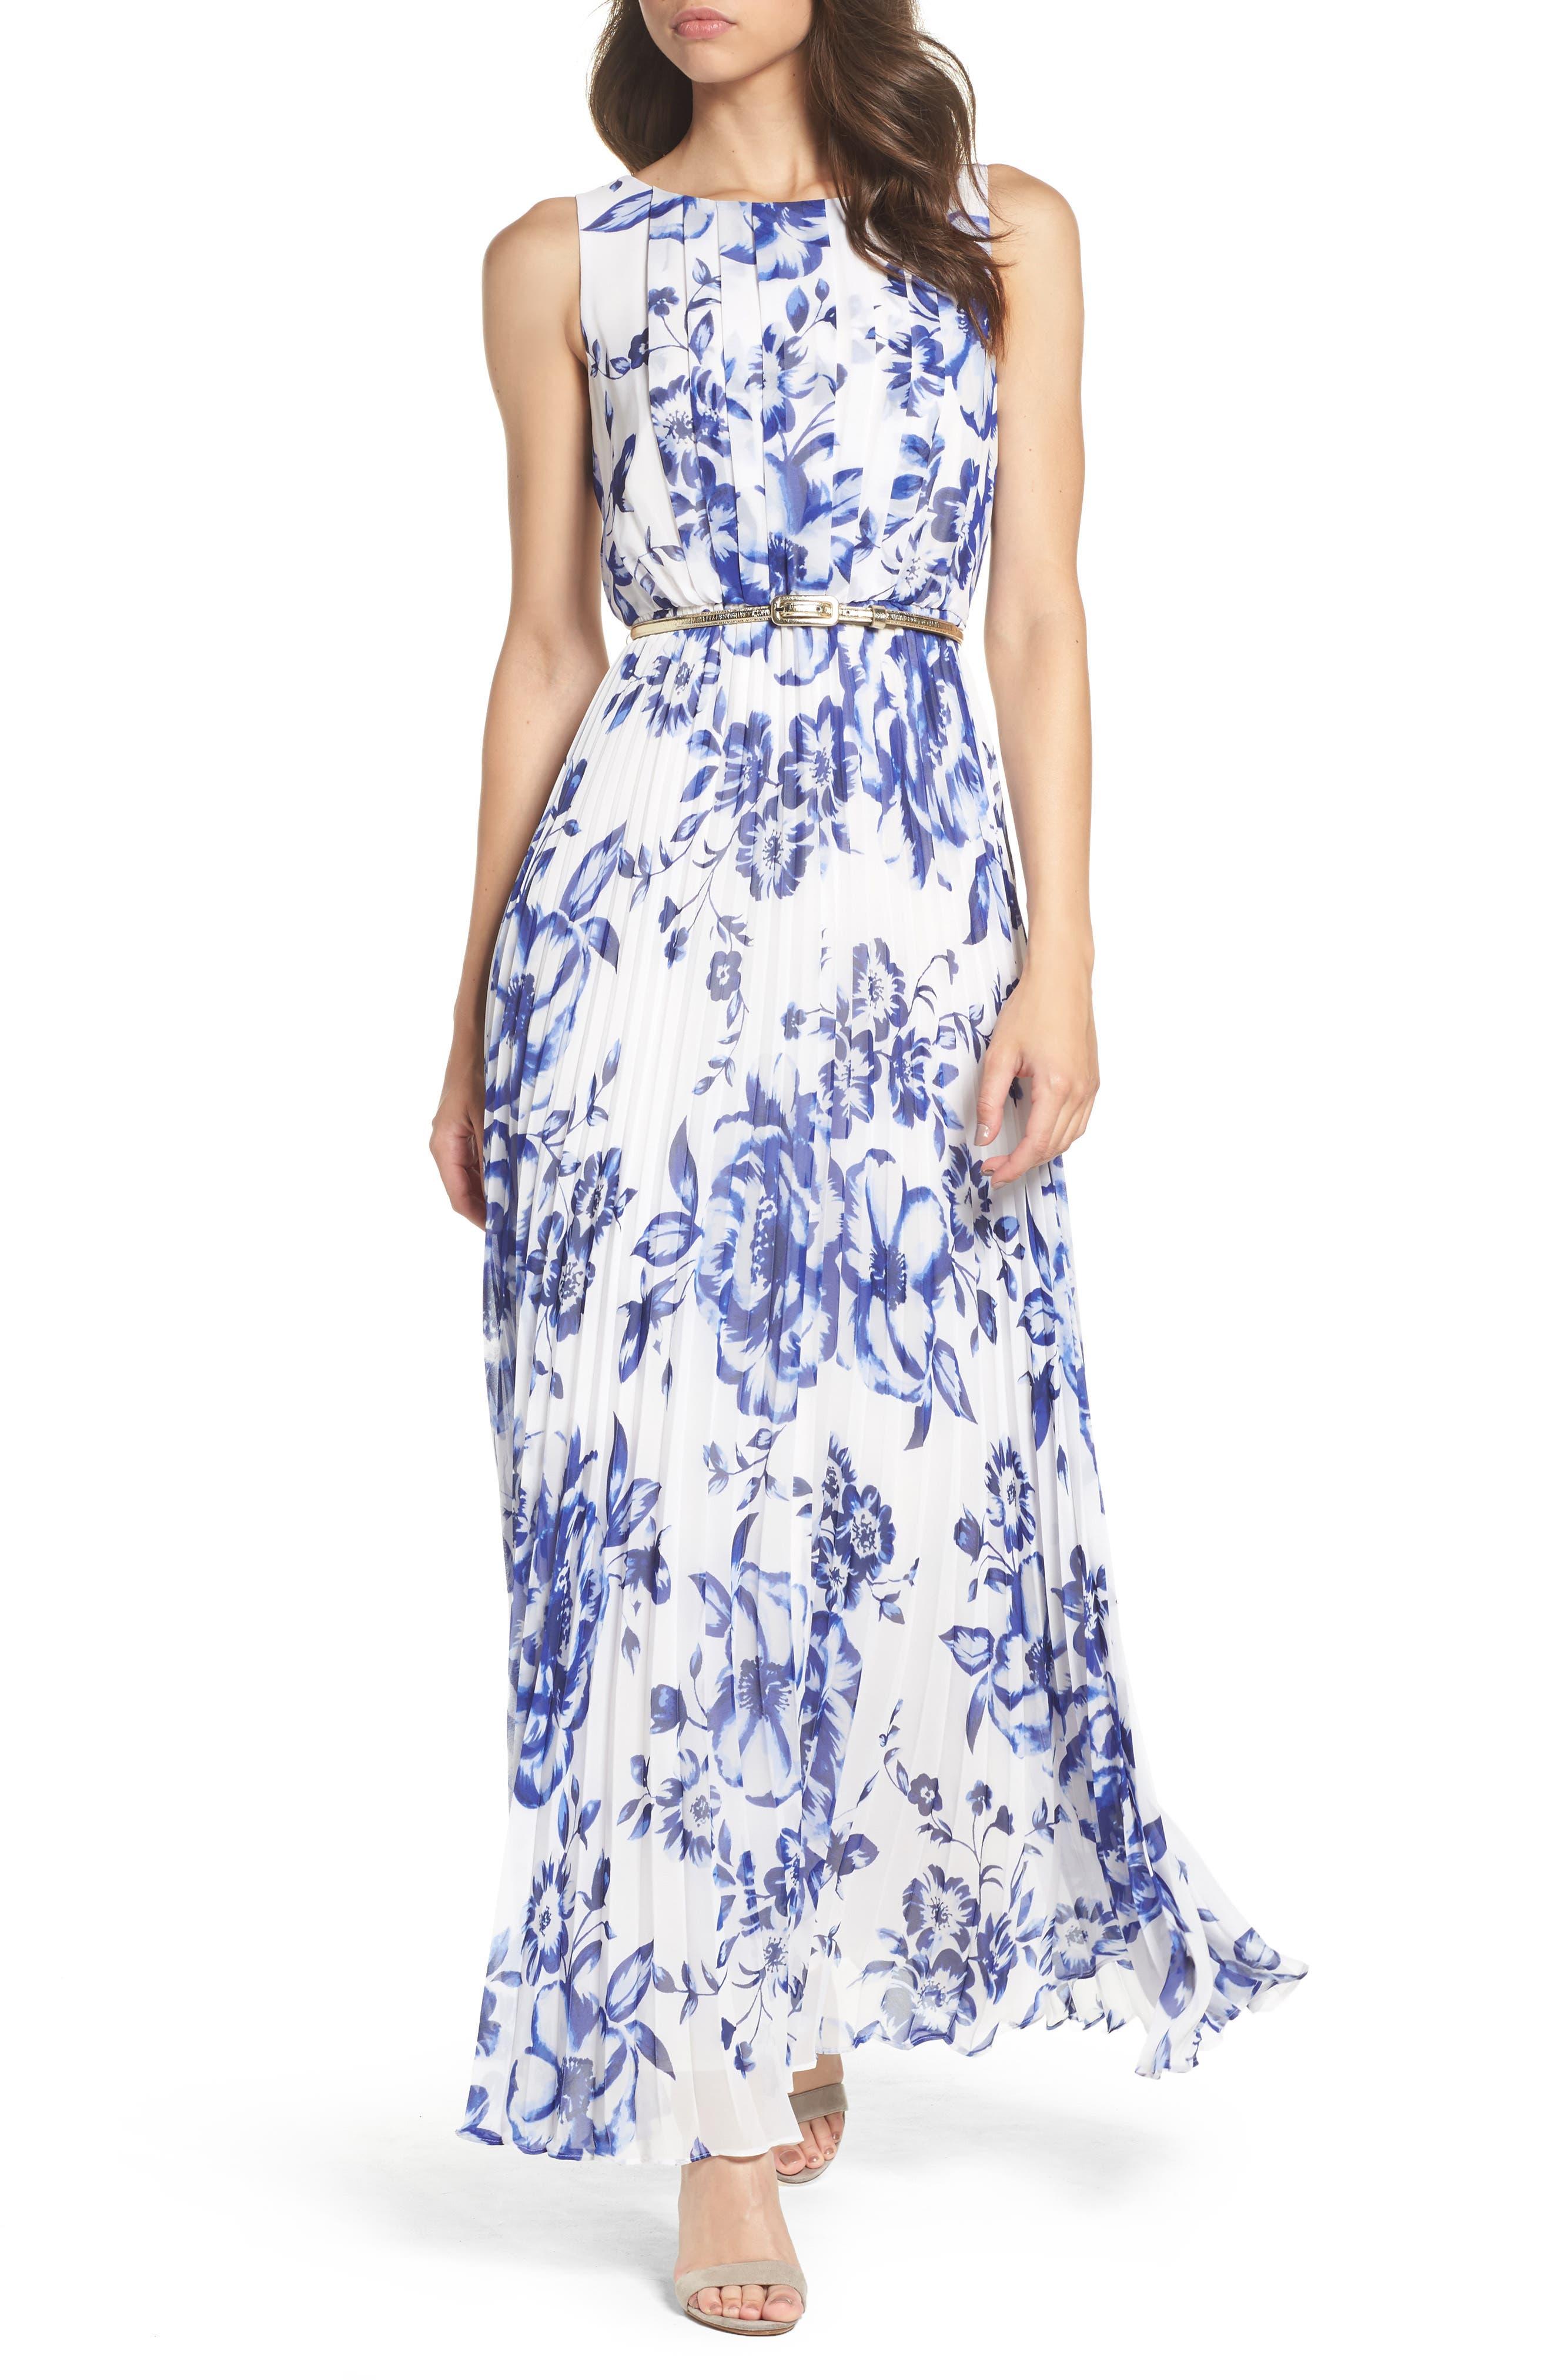 ELIZA J, Pleated Floral Chiffon Maxi Dress, Main thumbnail 1, color, COBALT